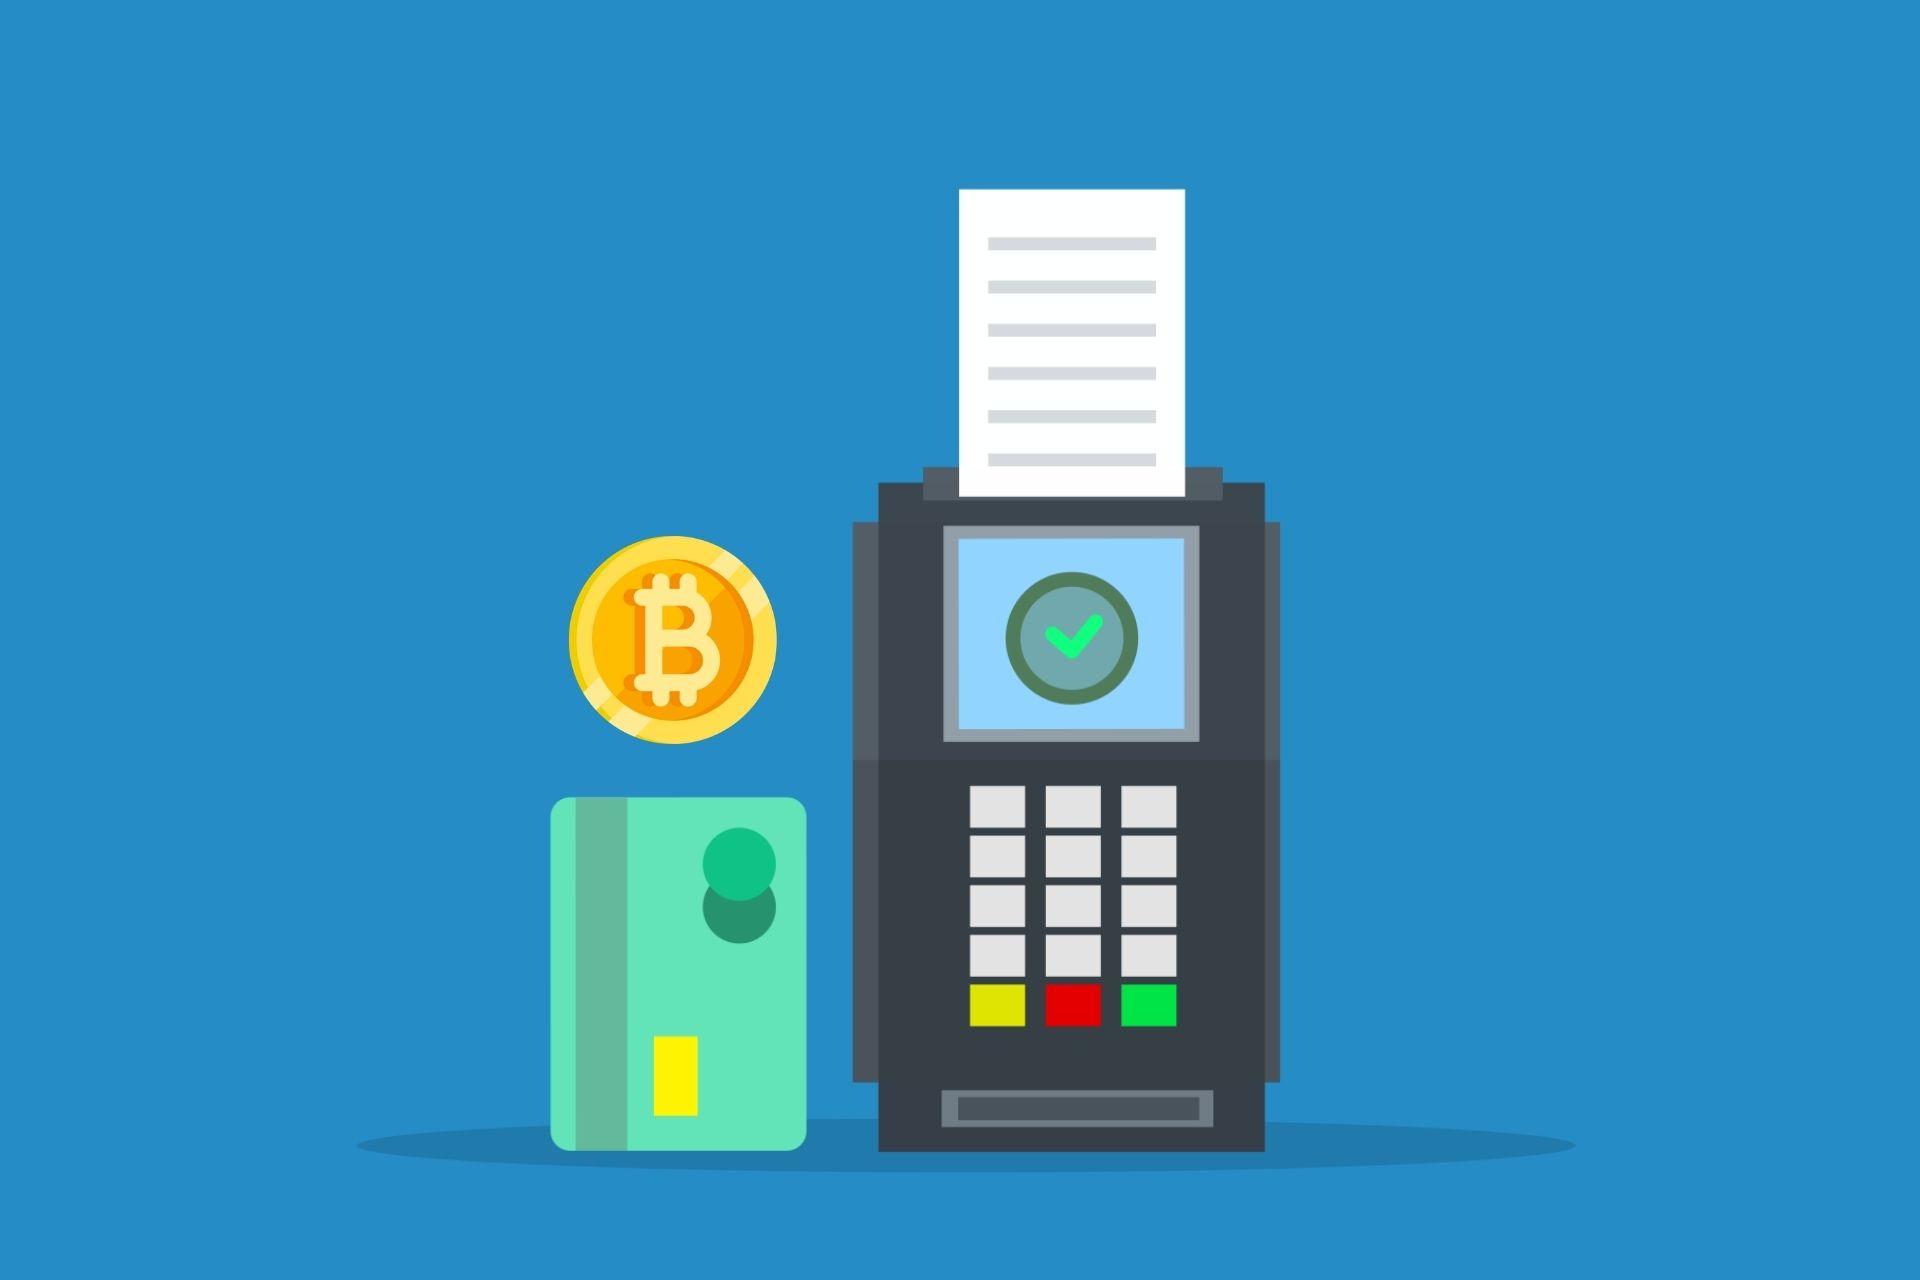 Uphold lanzará su tarjeta de débito multiactivos con soporte para criptomonedas en Europa